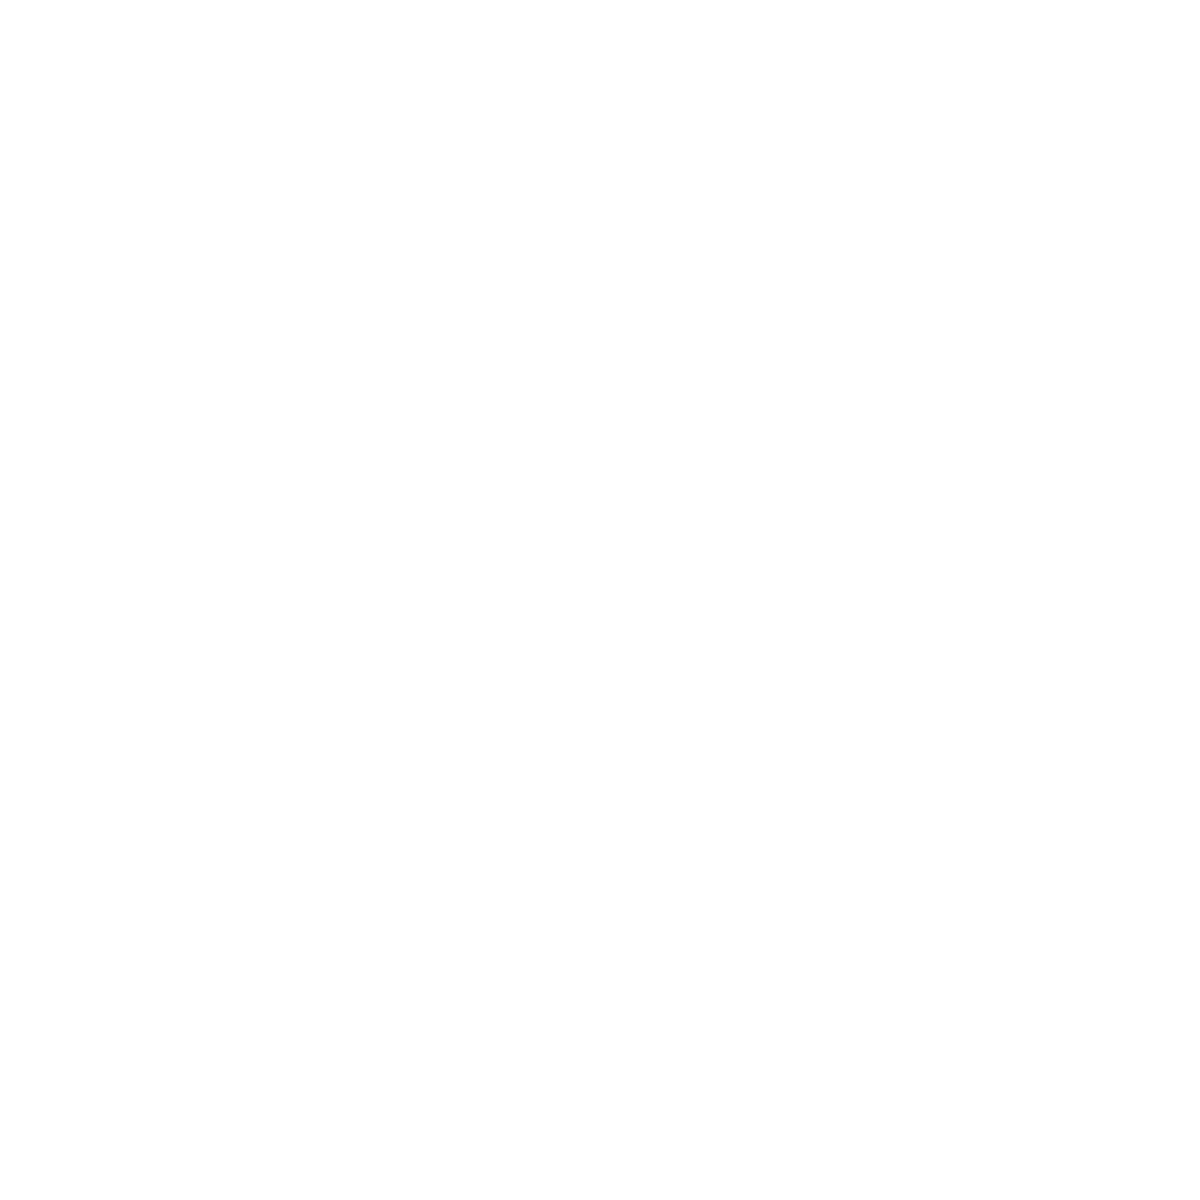 14200011